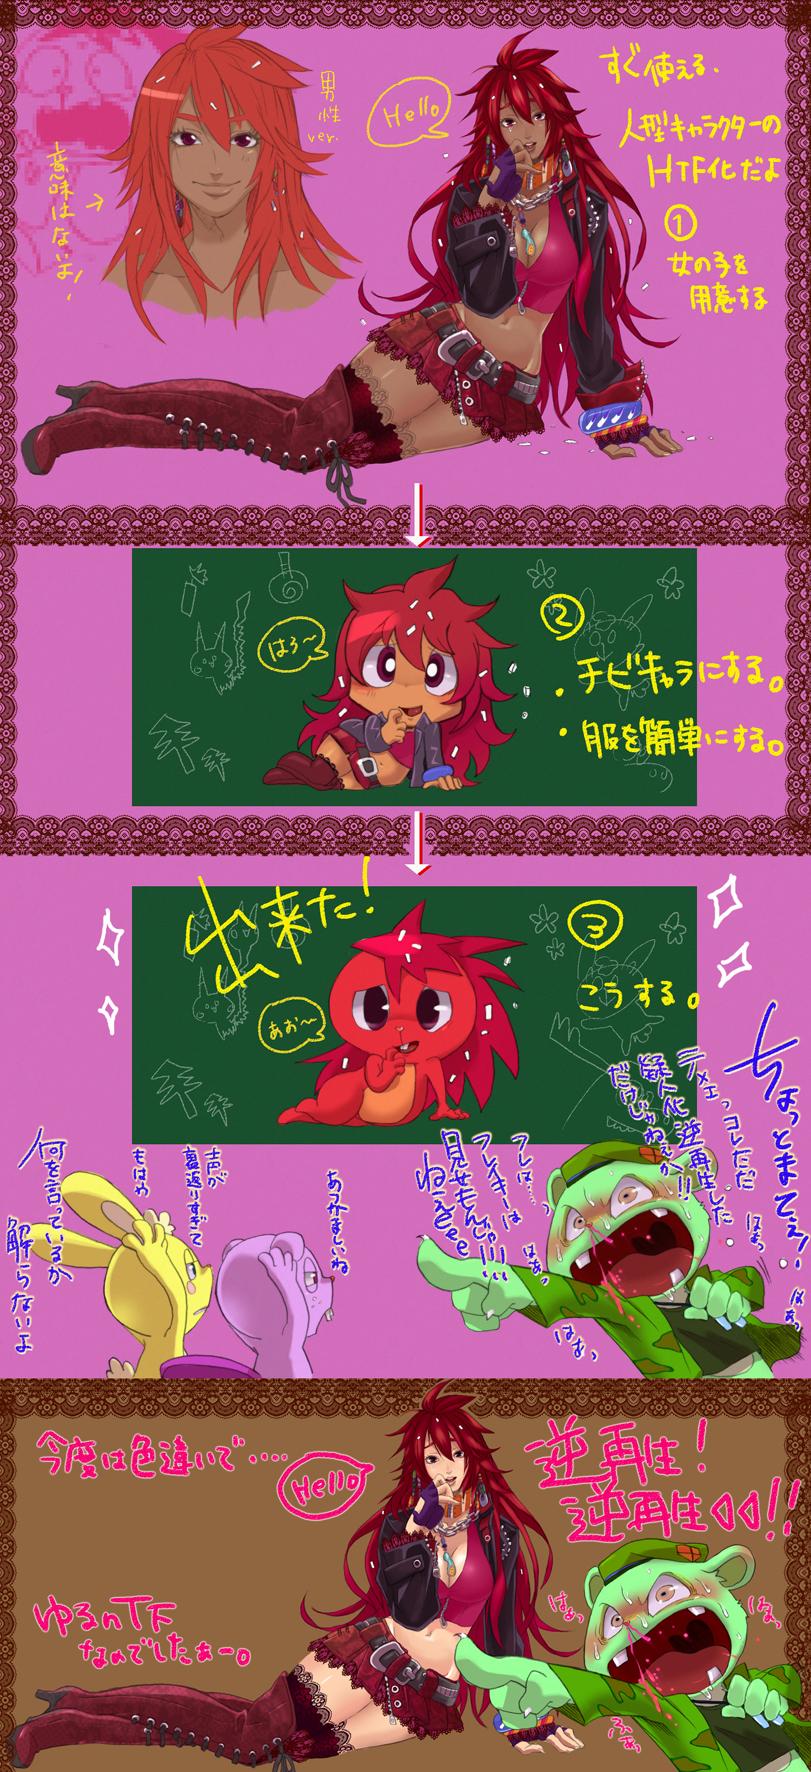 flippy friends anime tree happy How to get onto exhentai